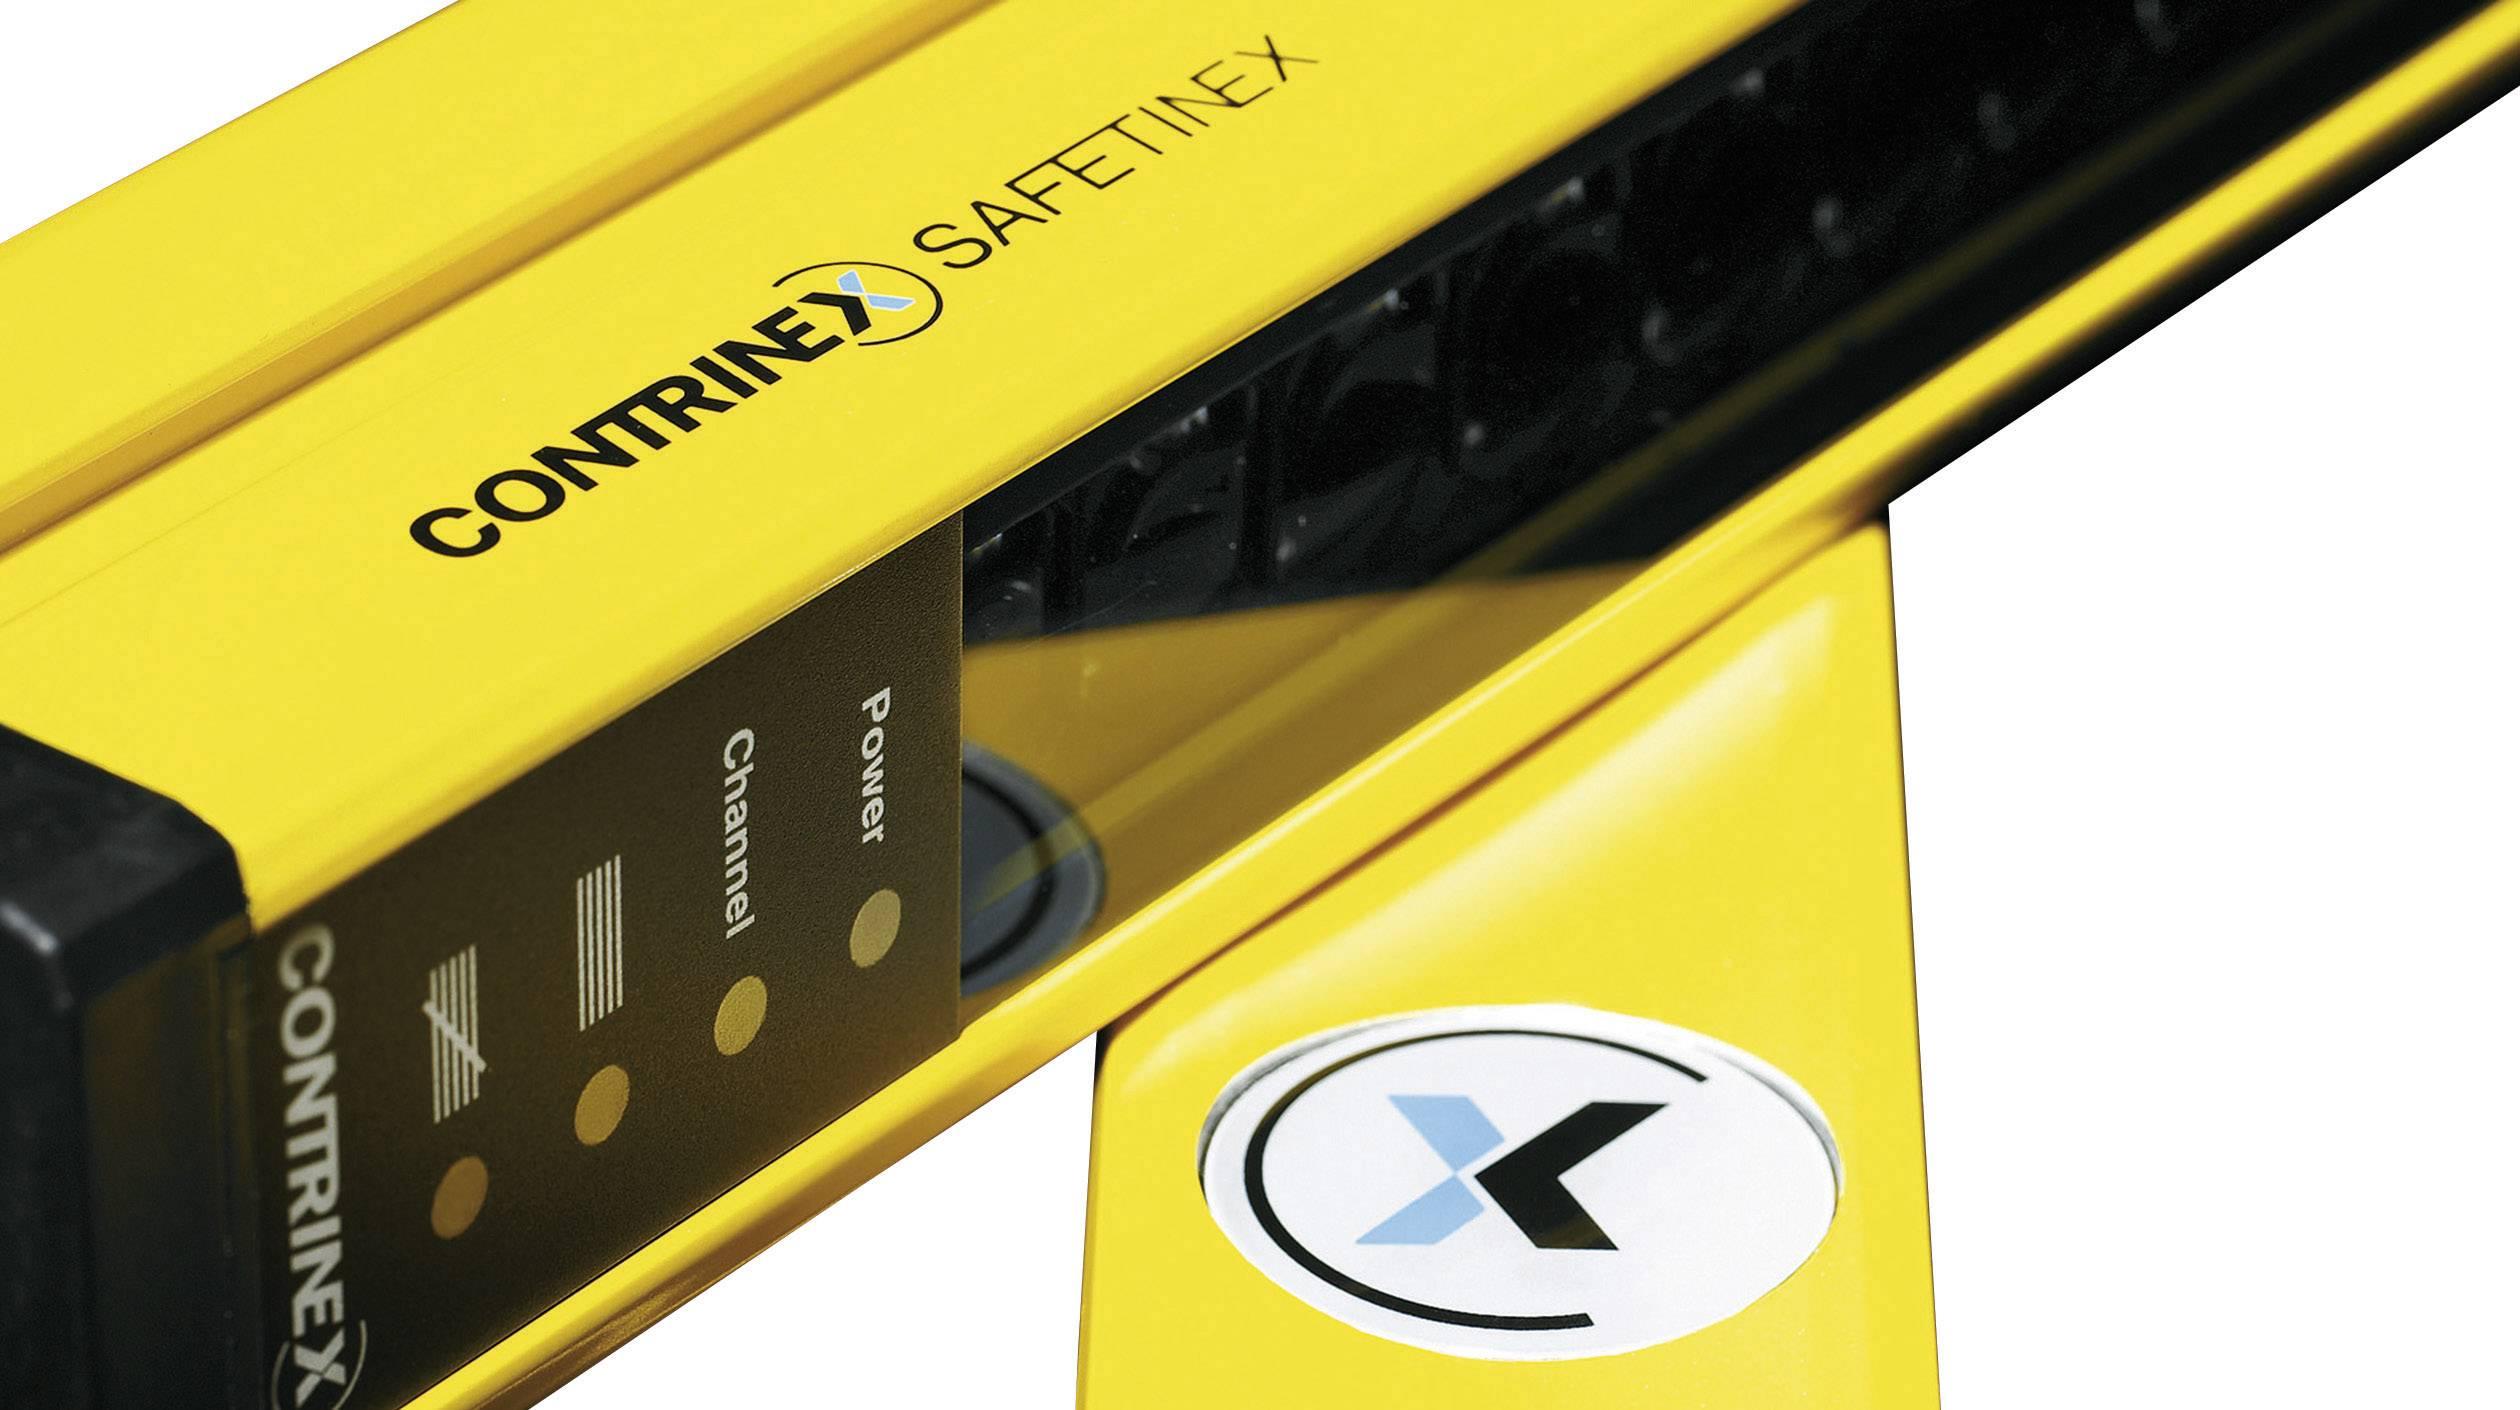 Contrinex YBB-30R4-0900-G012 630 000 687